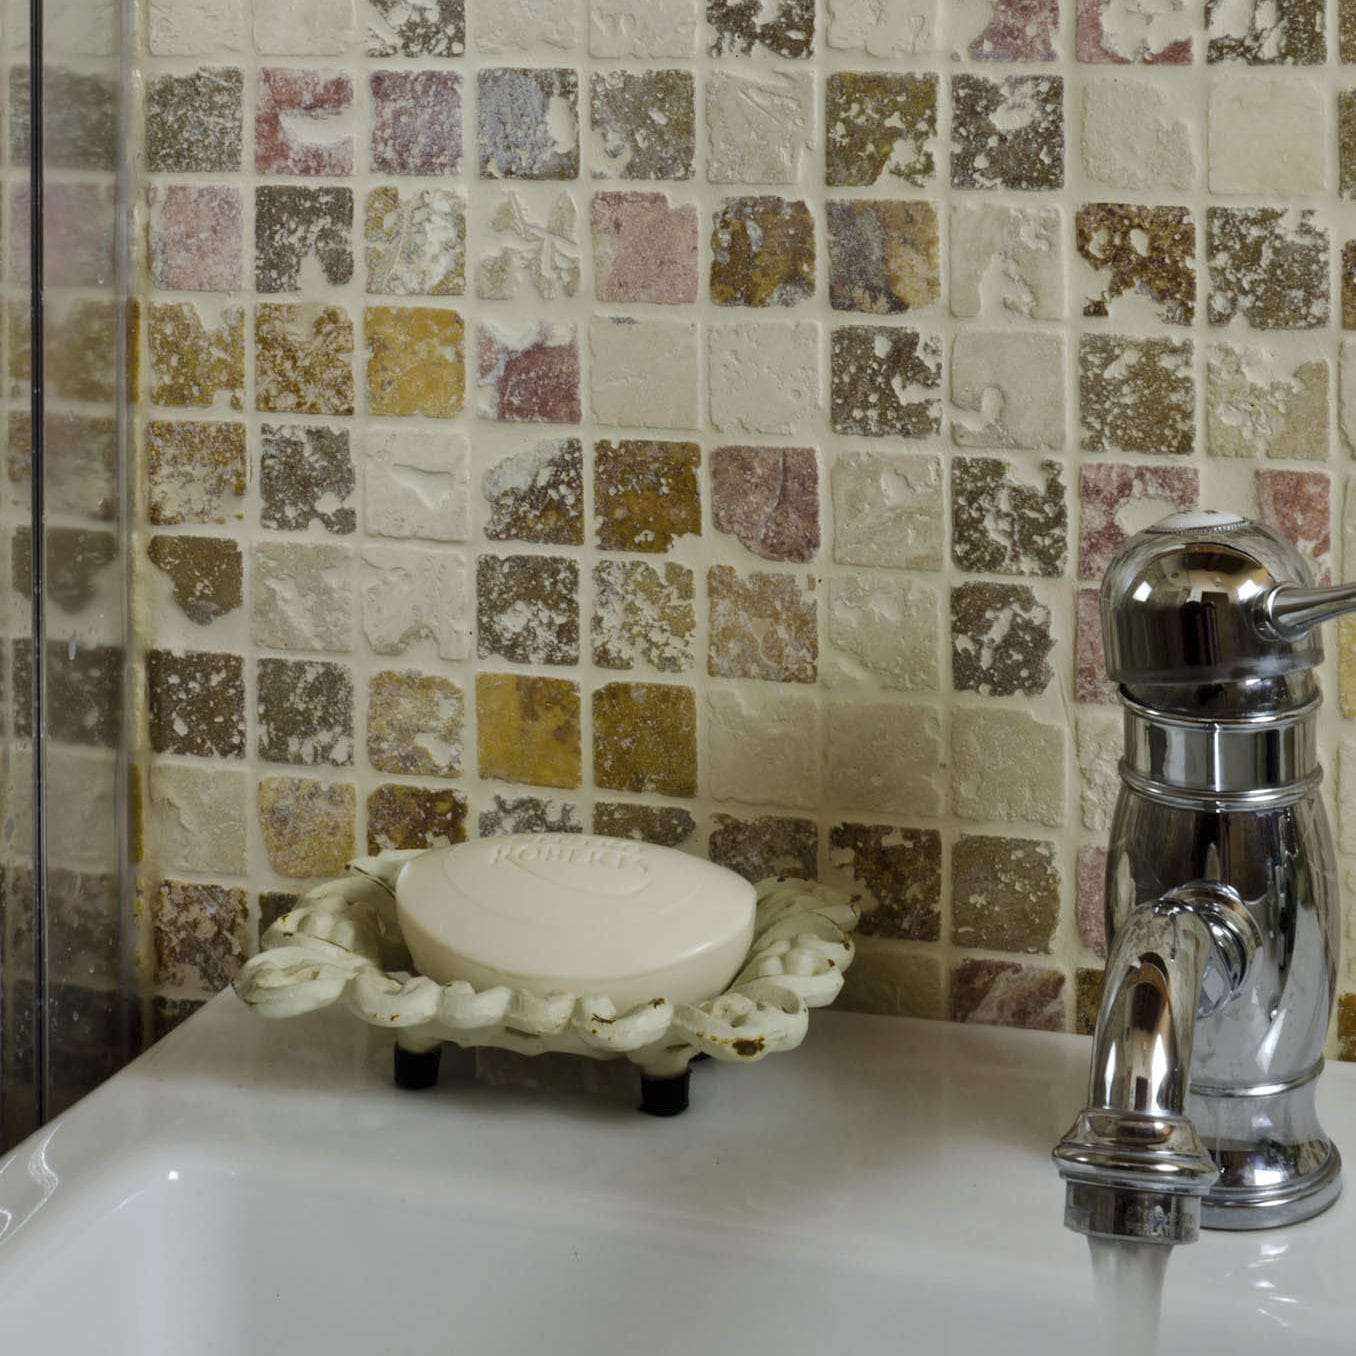 Bathroom Mosaic Tile Wall Natural Stone Plain X CORAL MIX - 3x3 ceramic wall tile